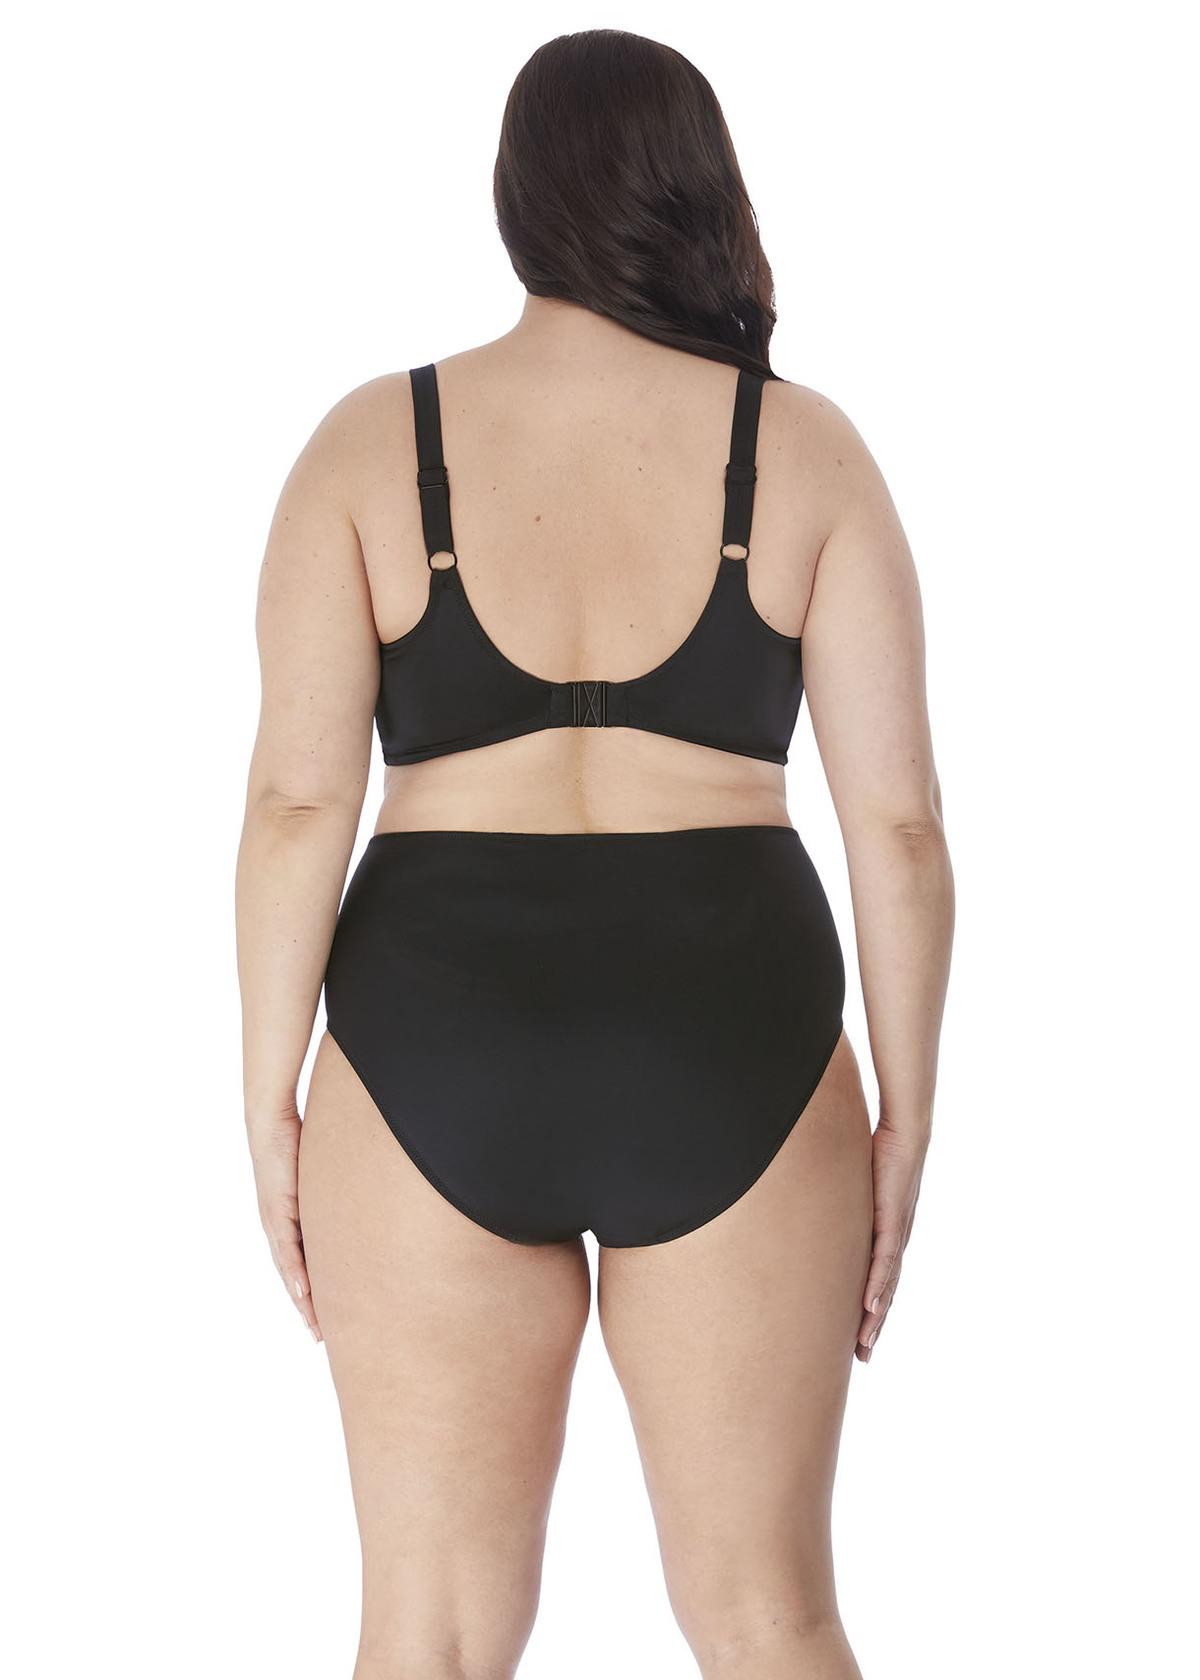 Купальники ES7192-BLK-back-Elomi-Swim-Magnetic-Black-Underwired-Sweetheart-Padded-Bikini-Top